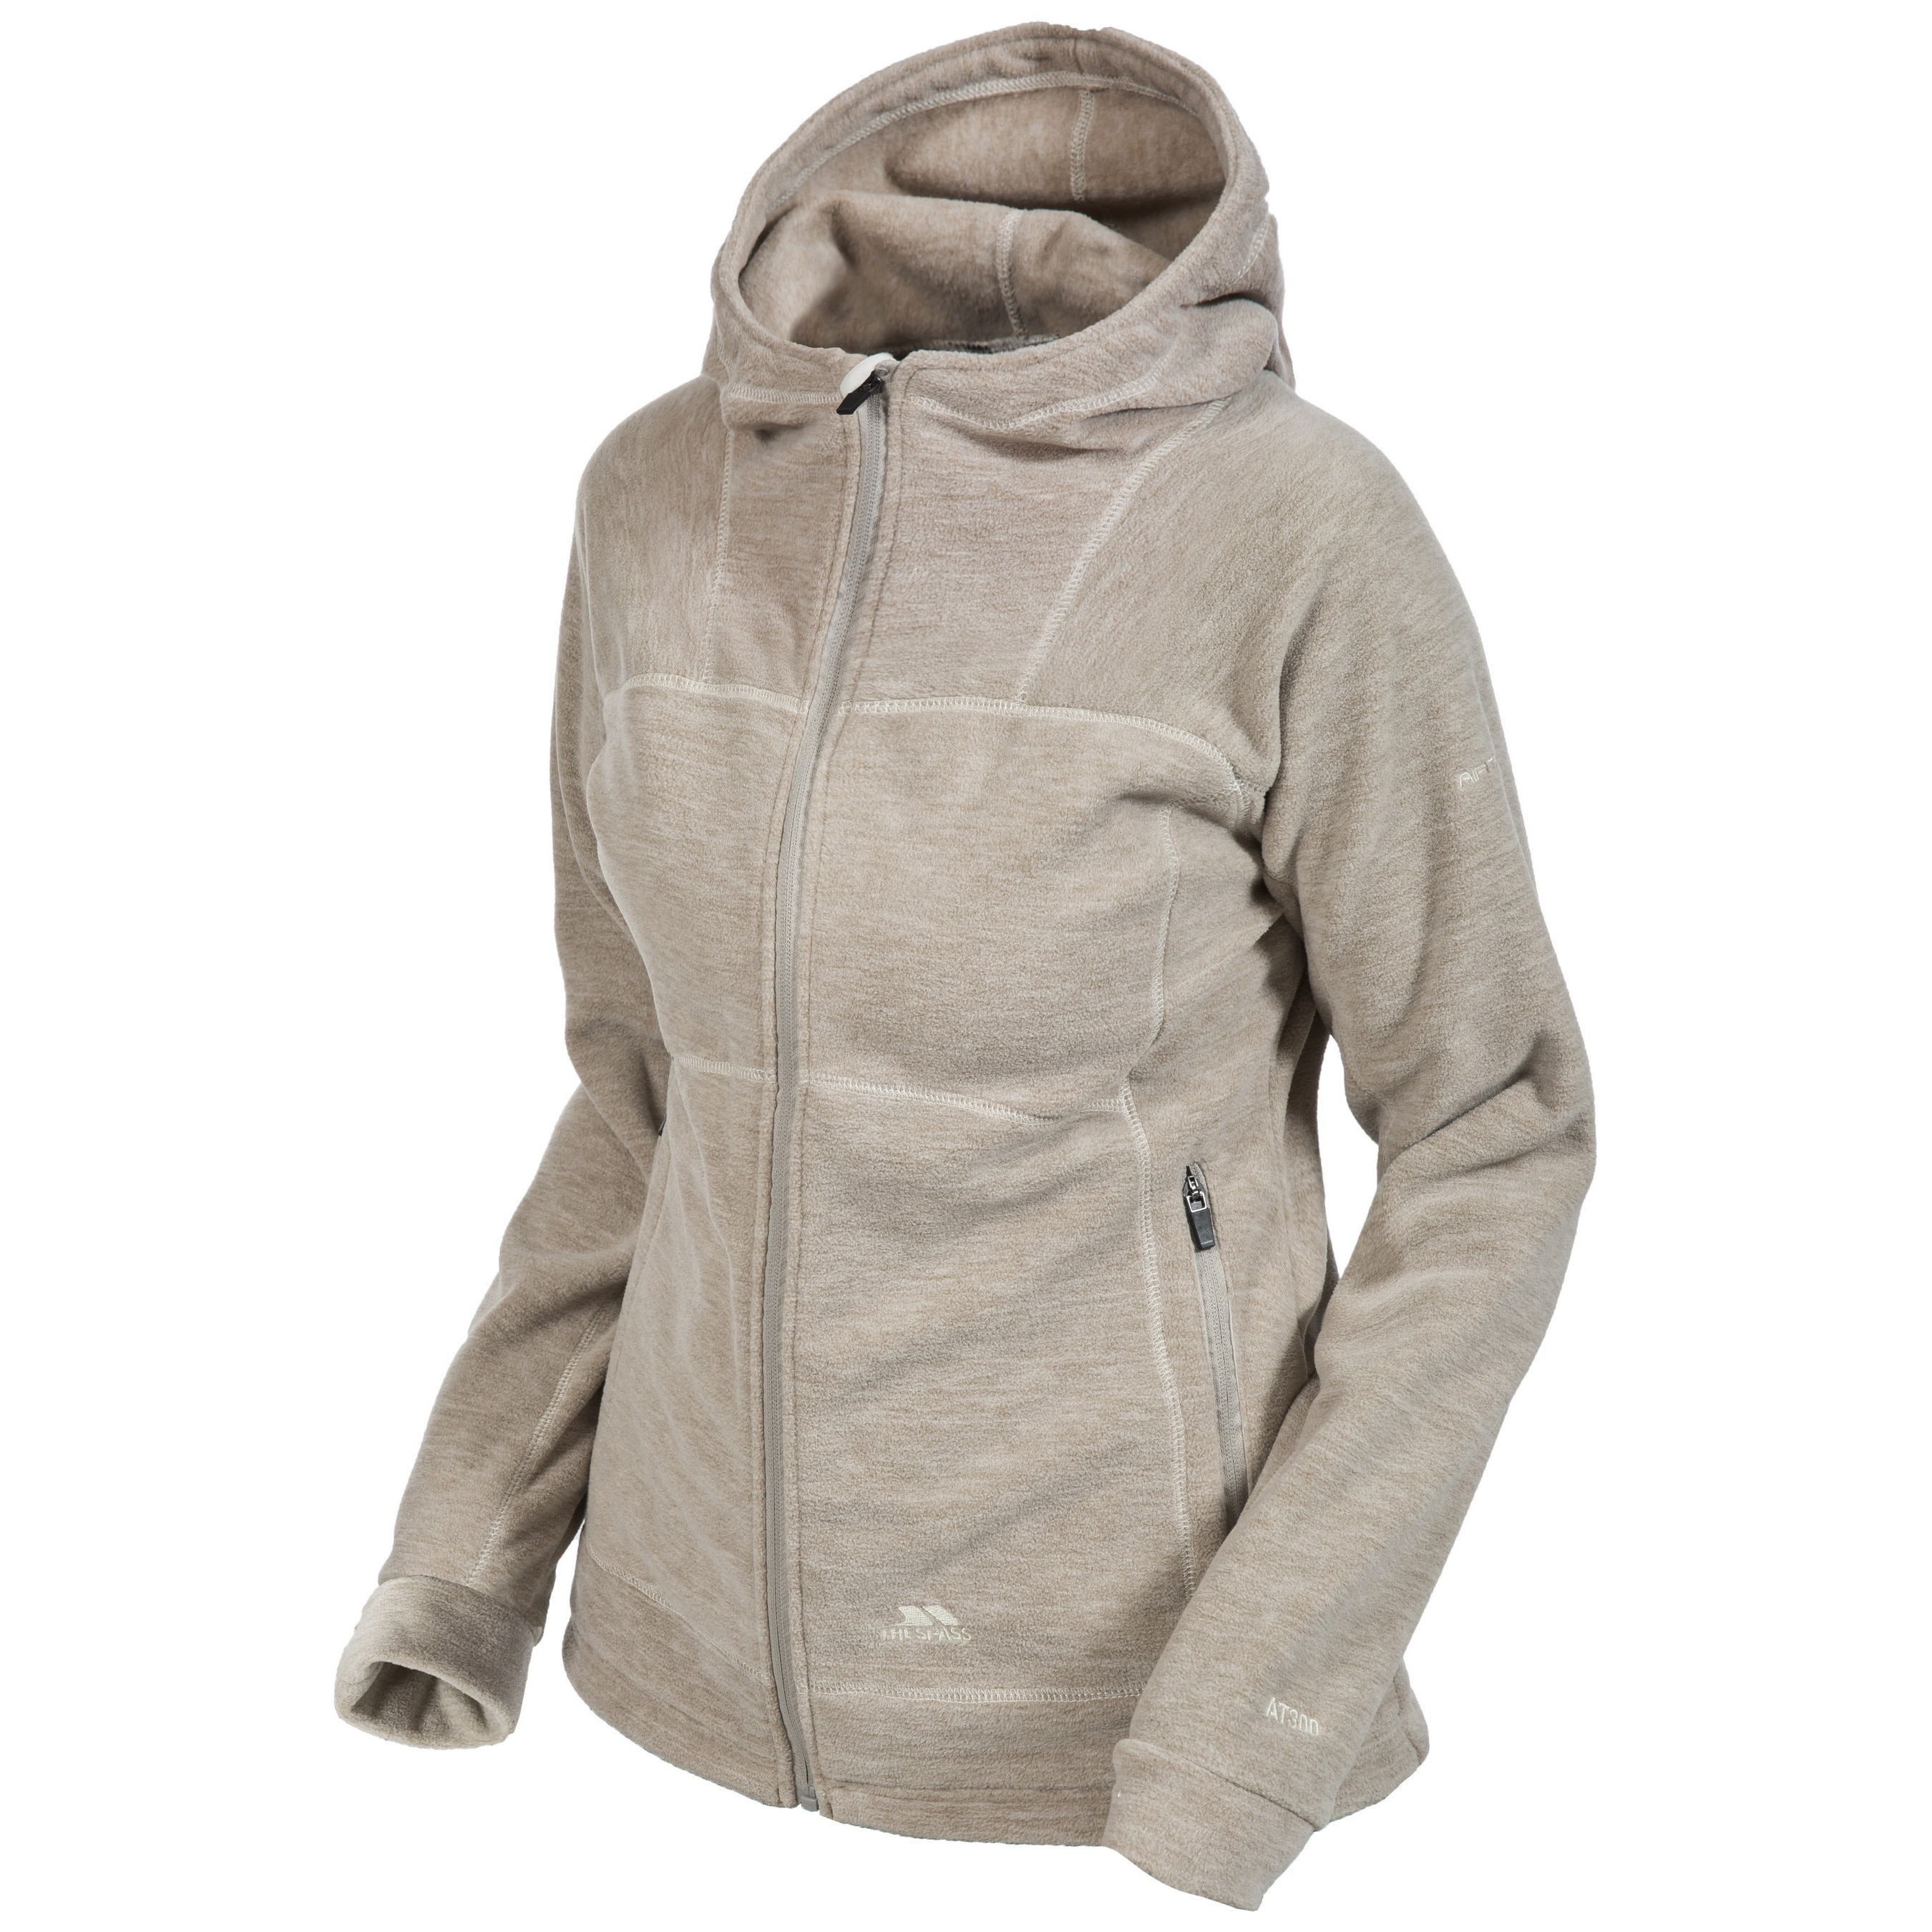 Trespass Fleecejacke Damen Scorch Fleece-Jacke mit Kapuze